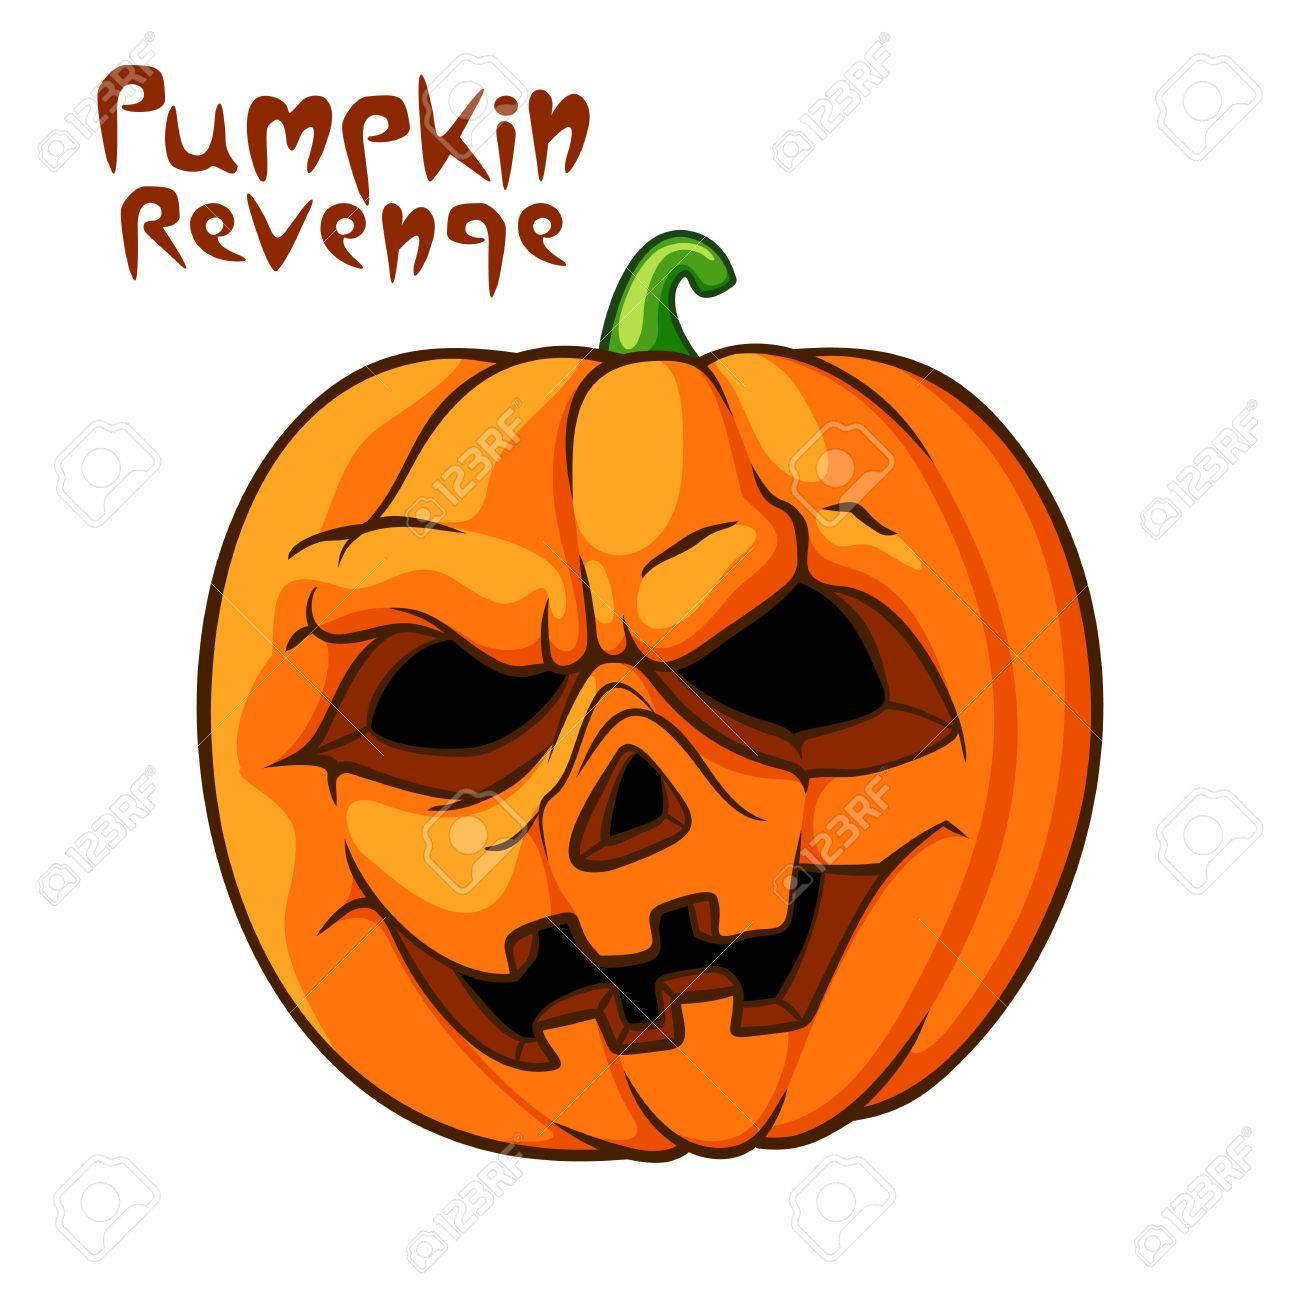 Halloween Pumpkin Vector.Halloween Scary Pumpkin Vector Illustration Pumpkin Revenge